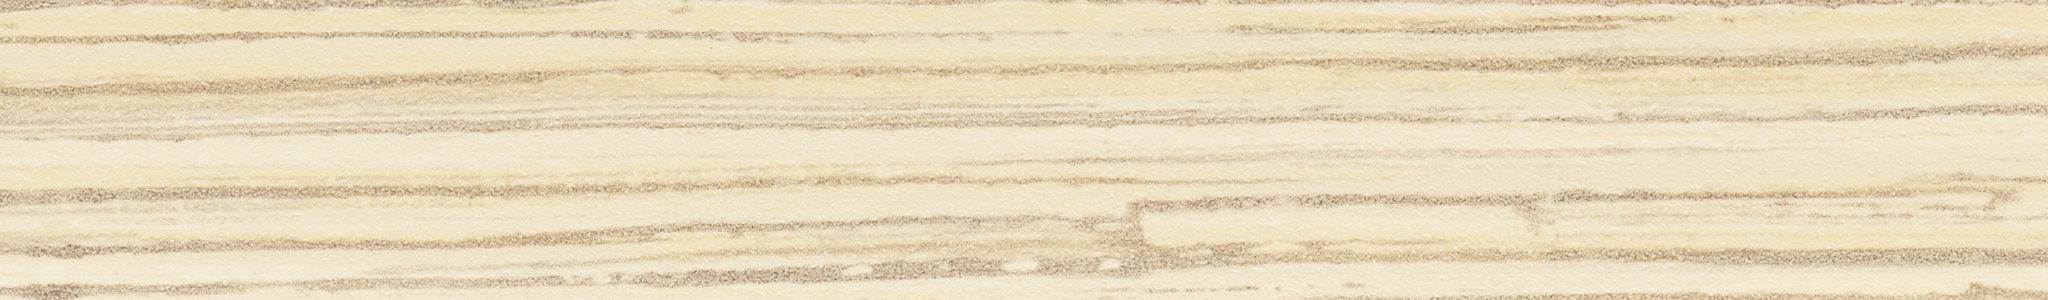 HD 293298 кромка ABS трава морская жемчуг